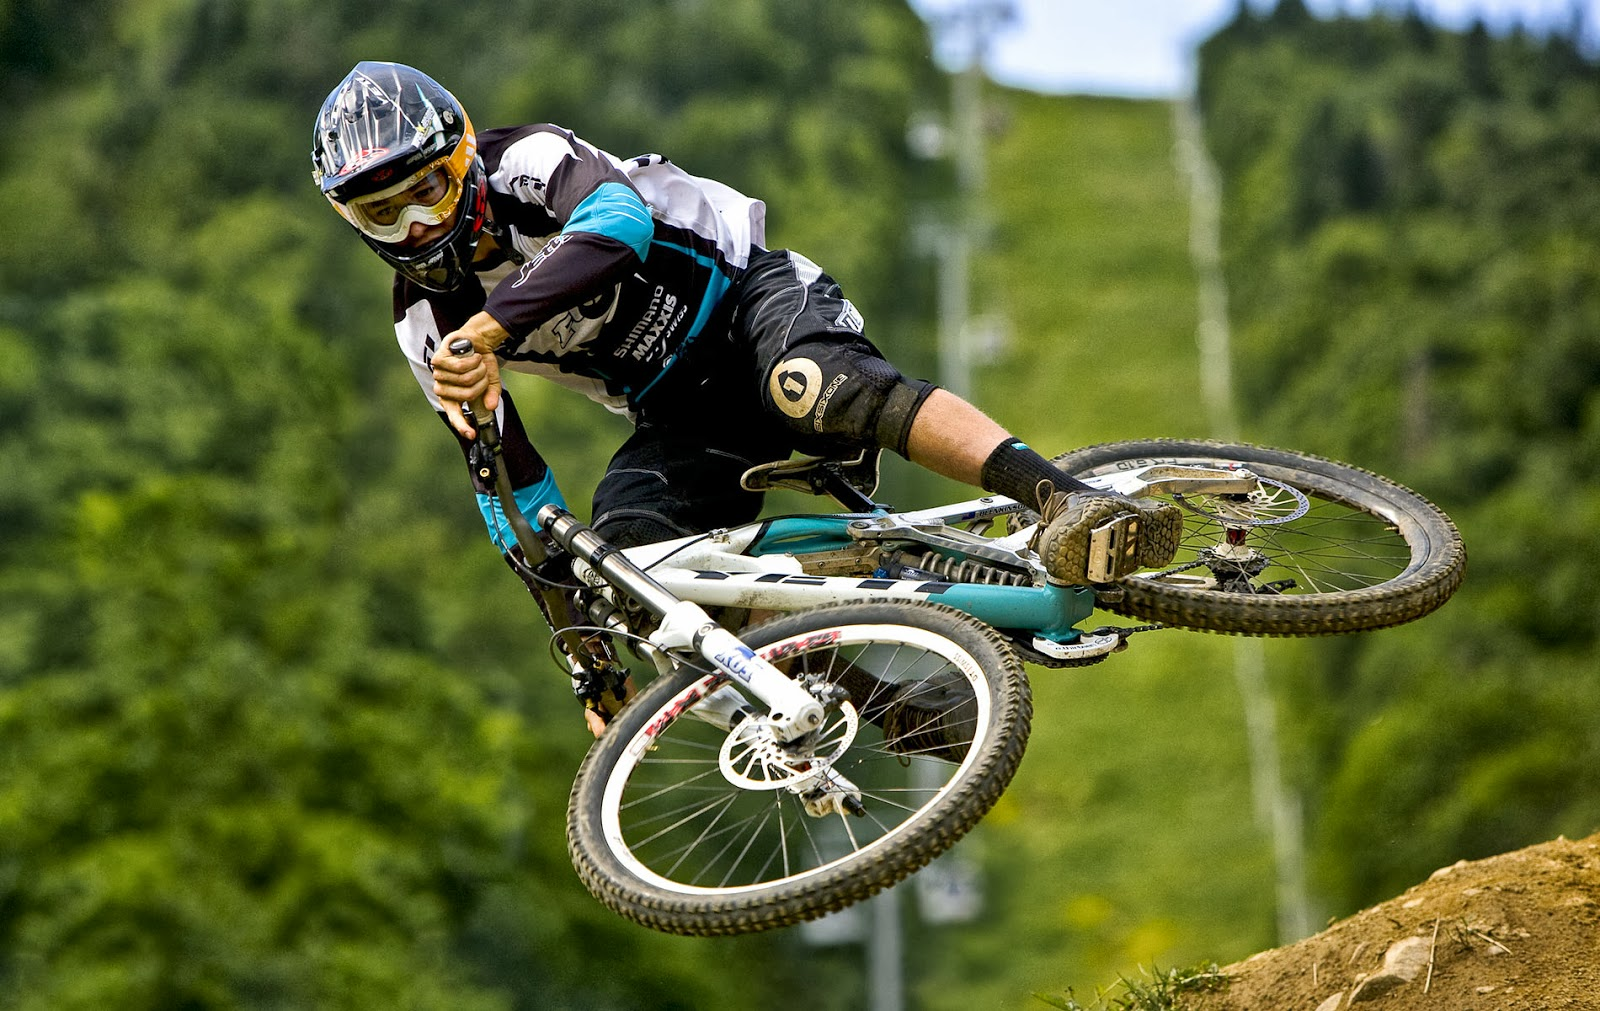 Super Sport Bikes New 2013 Hd Wallpapers  New Santa Banta-4944